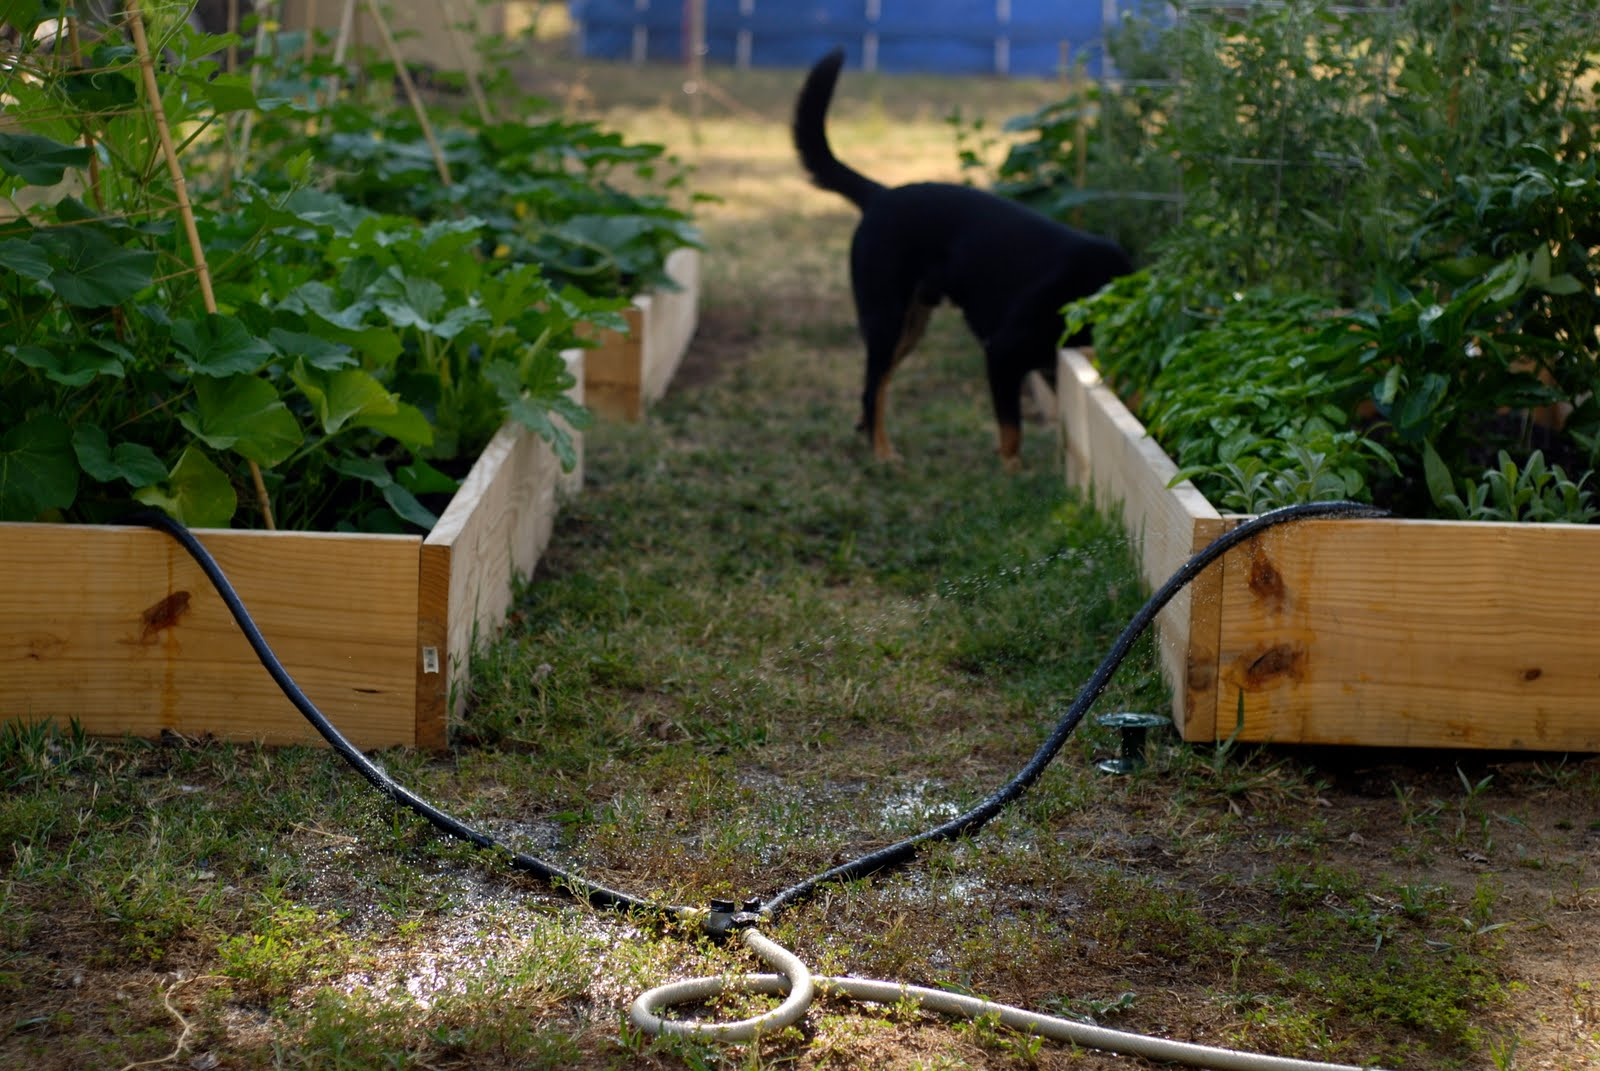 tend soaker hose for the garden